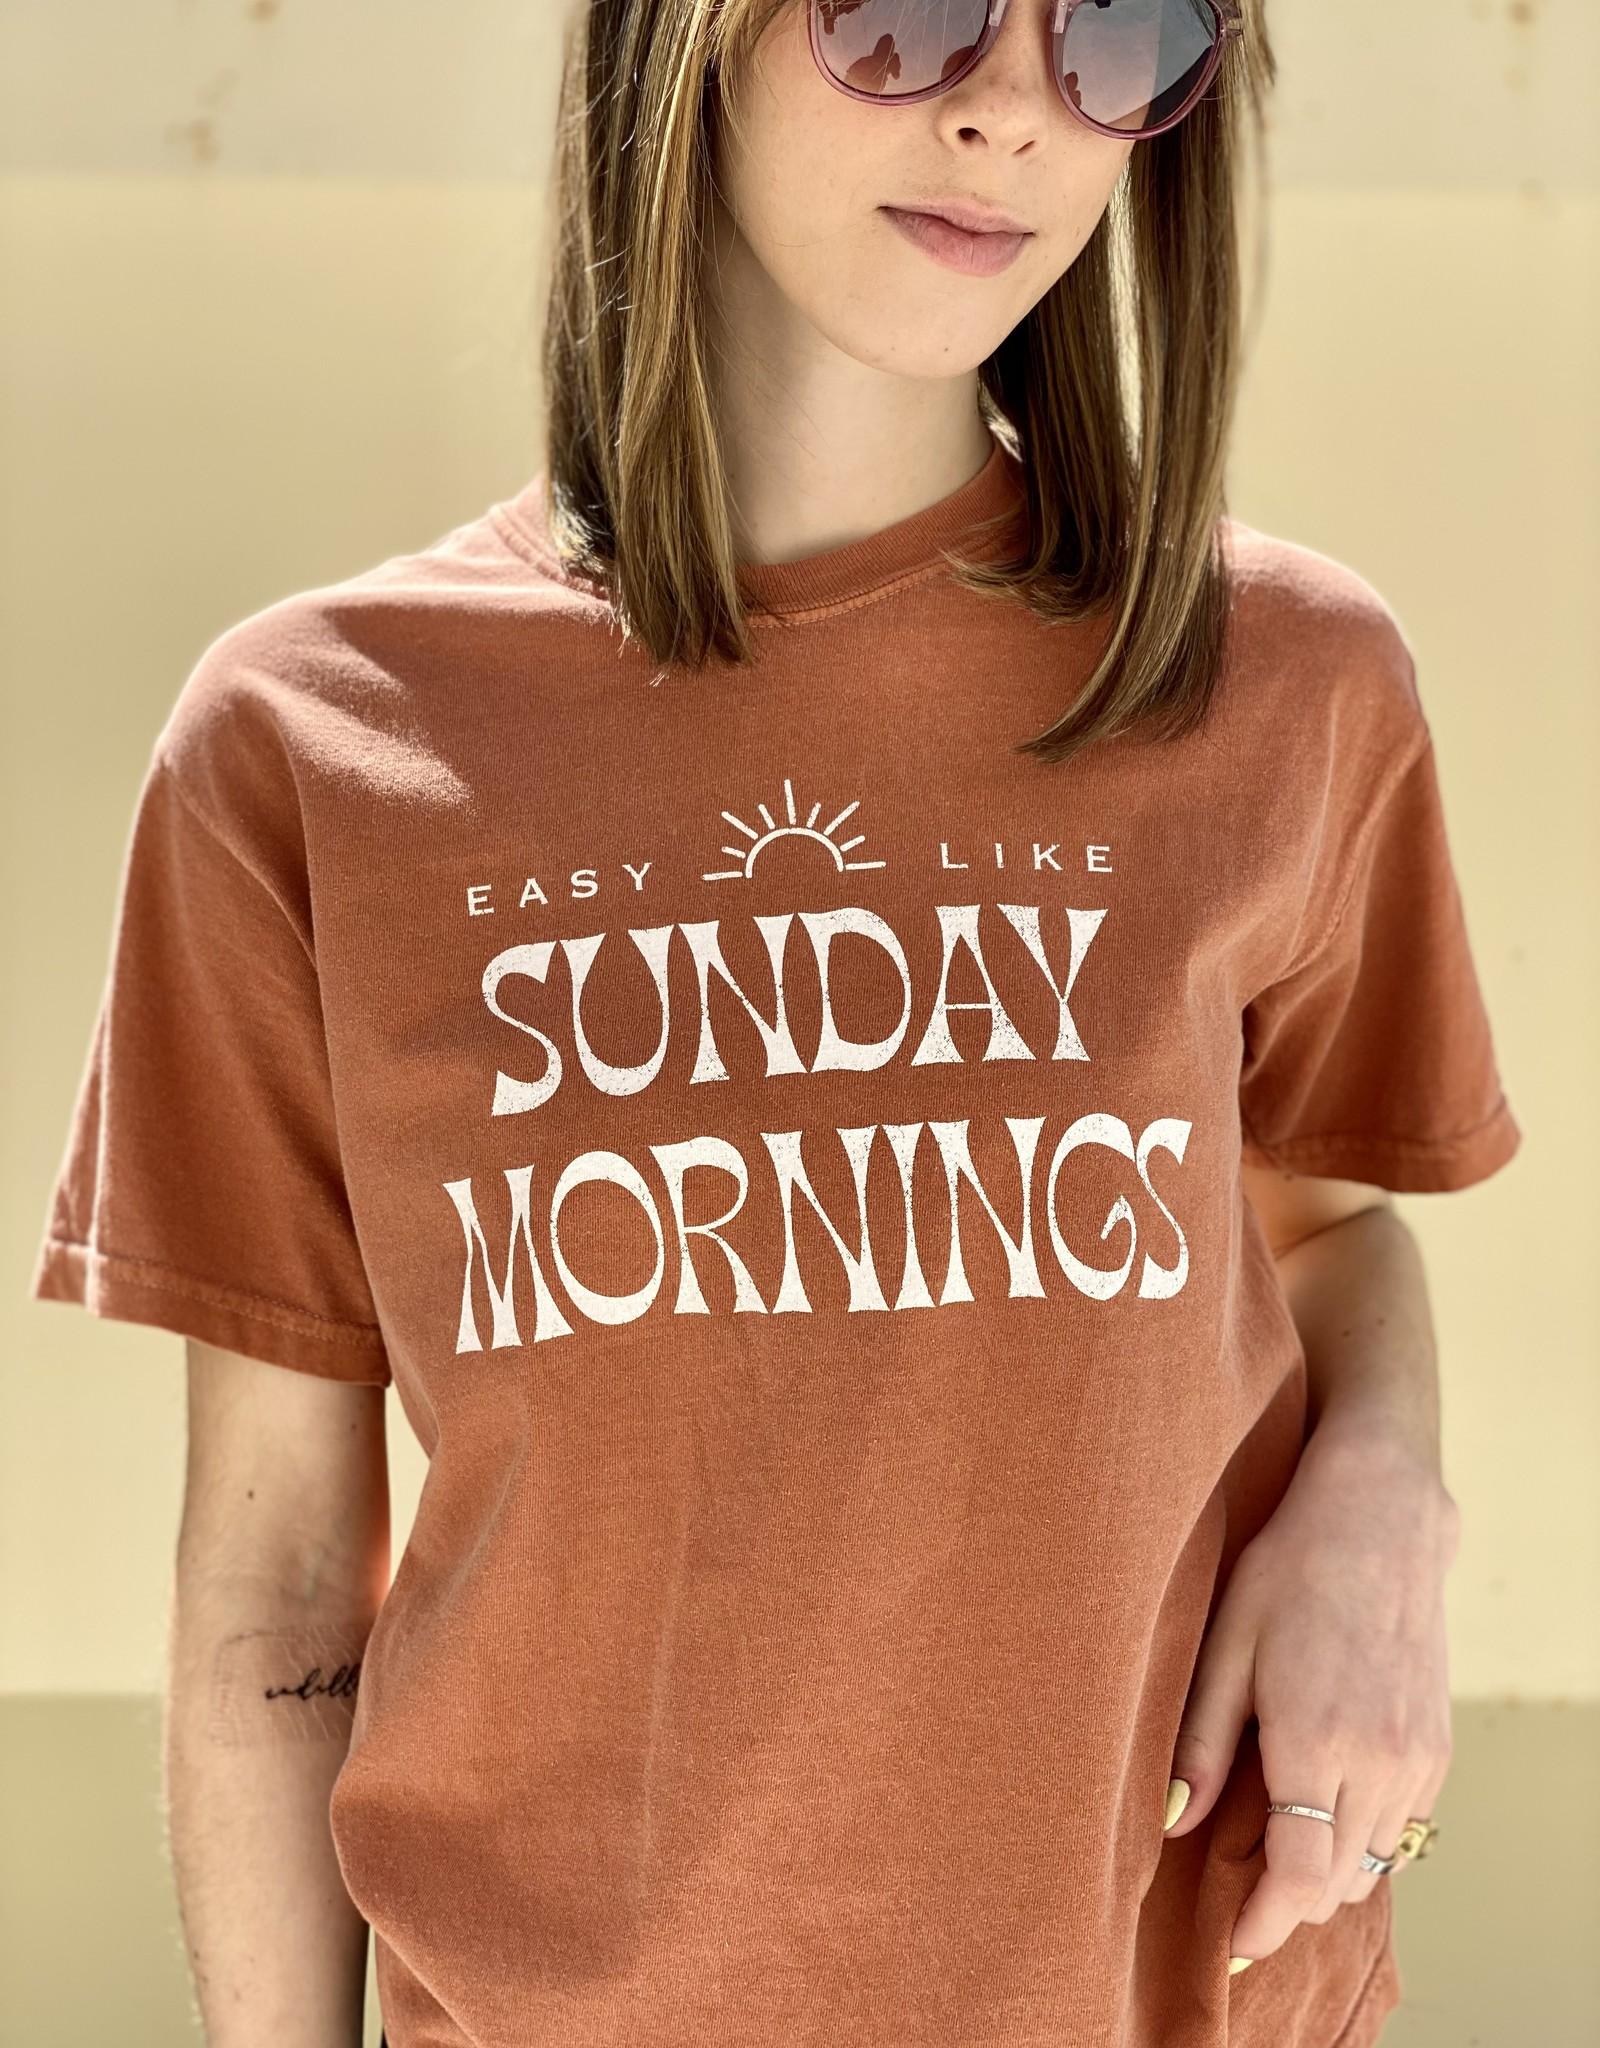 HUSH Easy like Sunday morning graphic tee